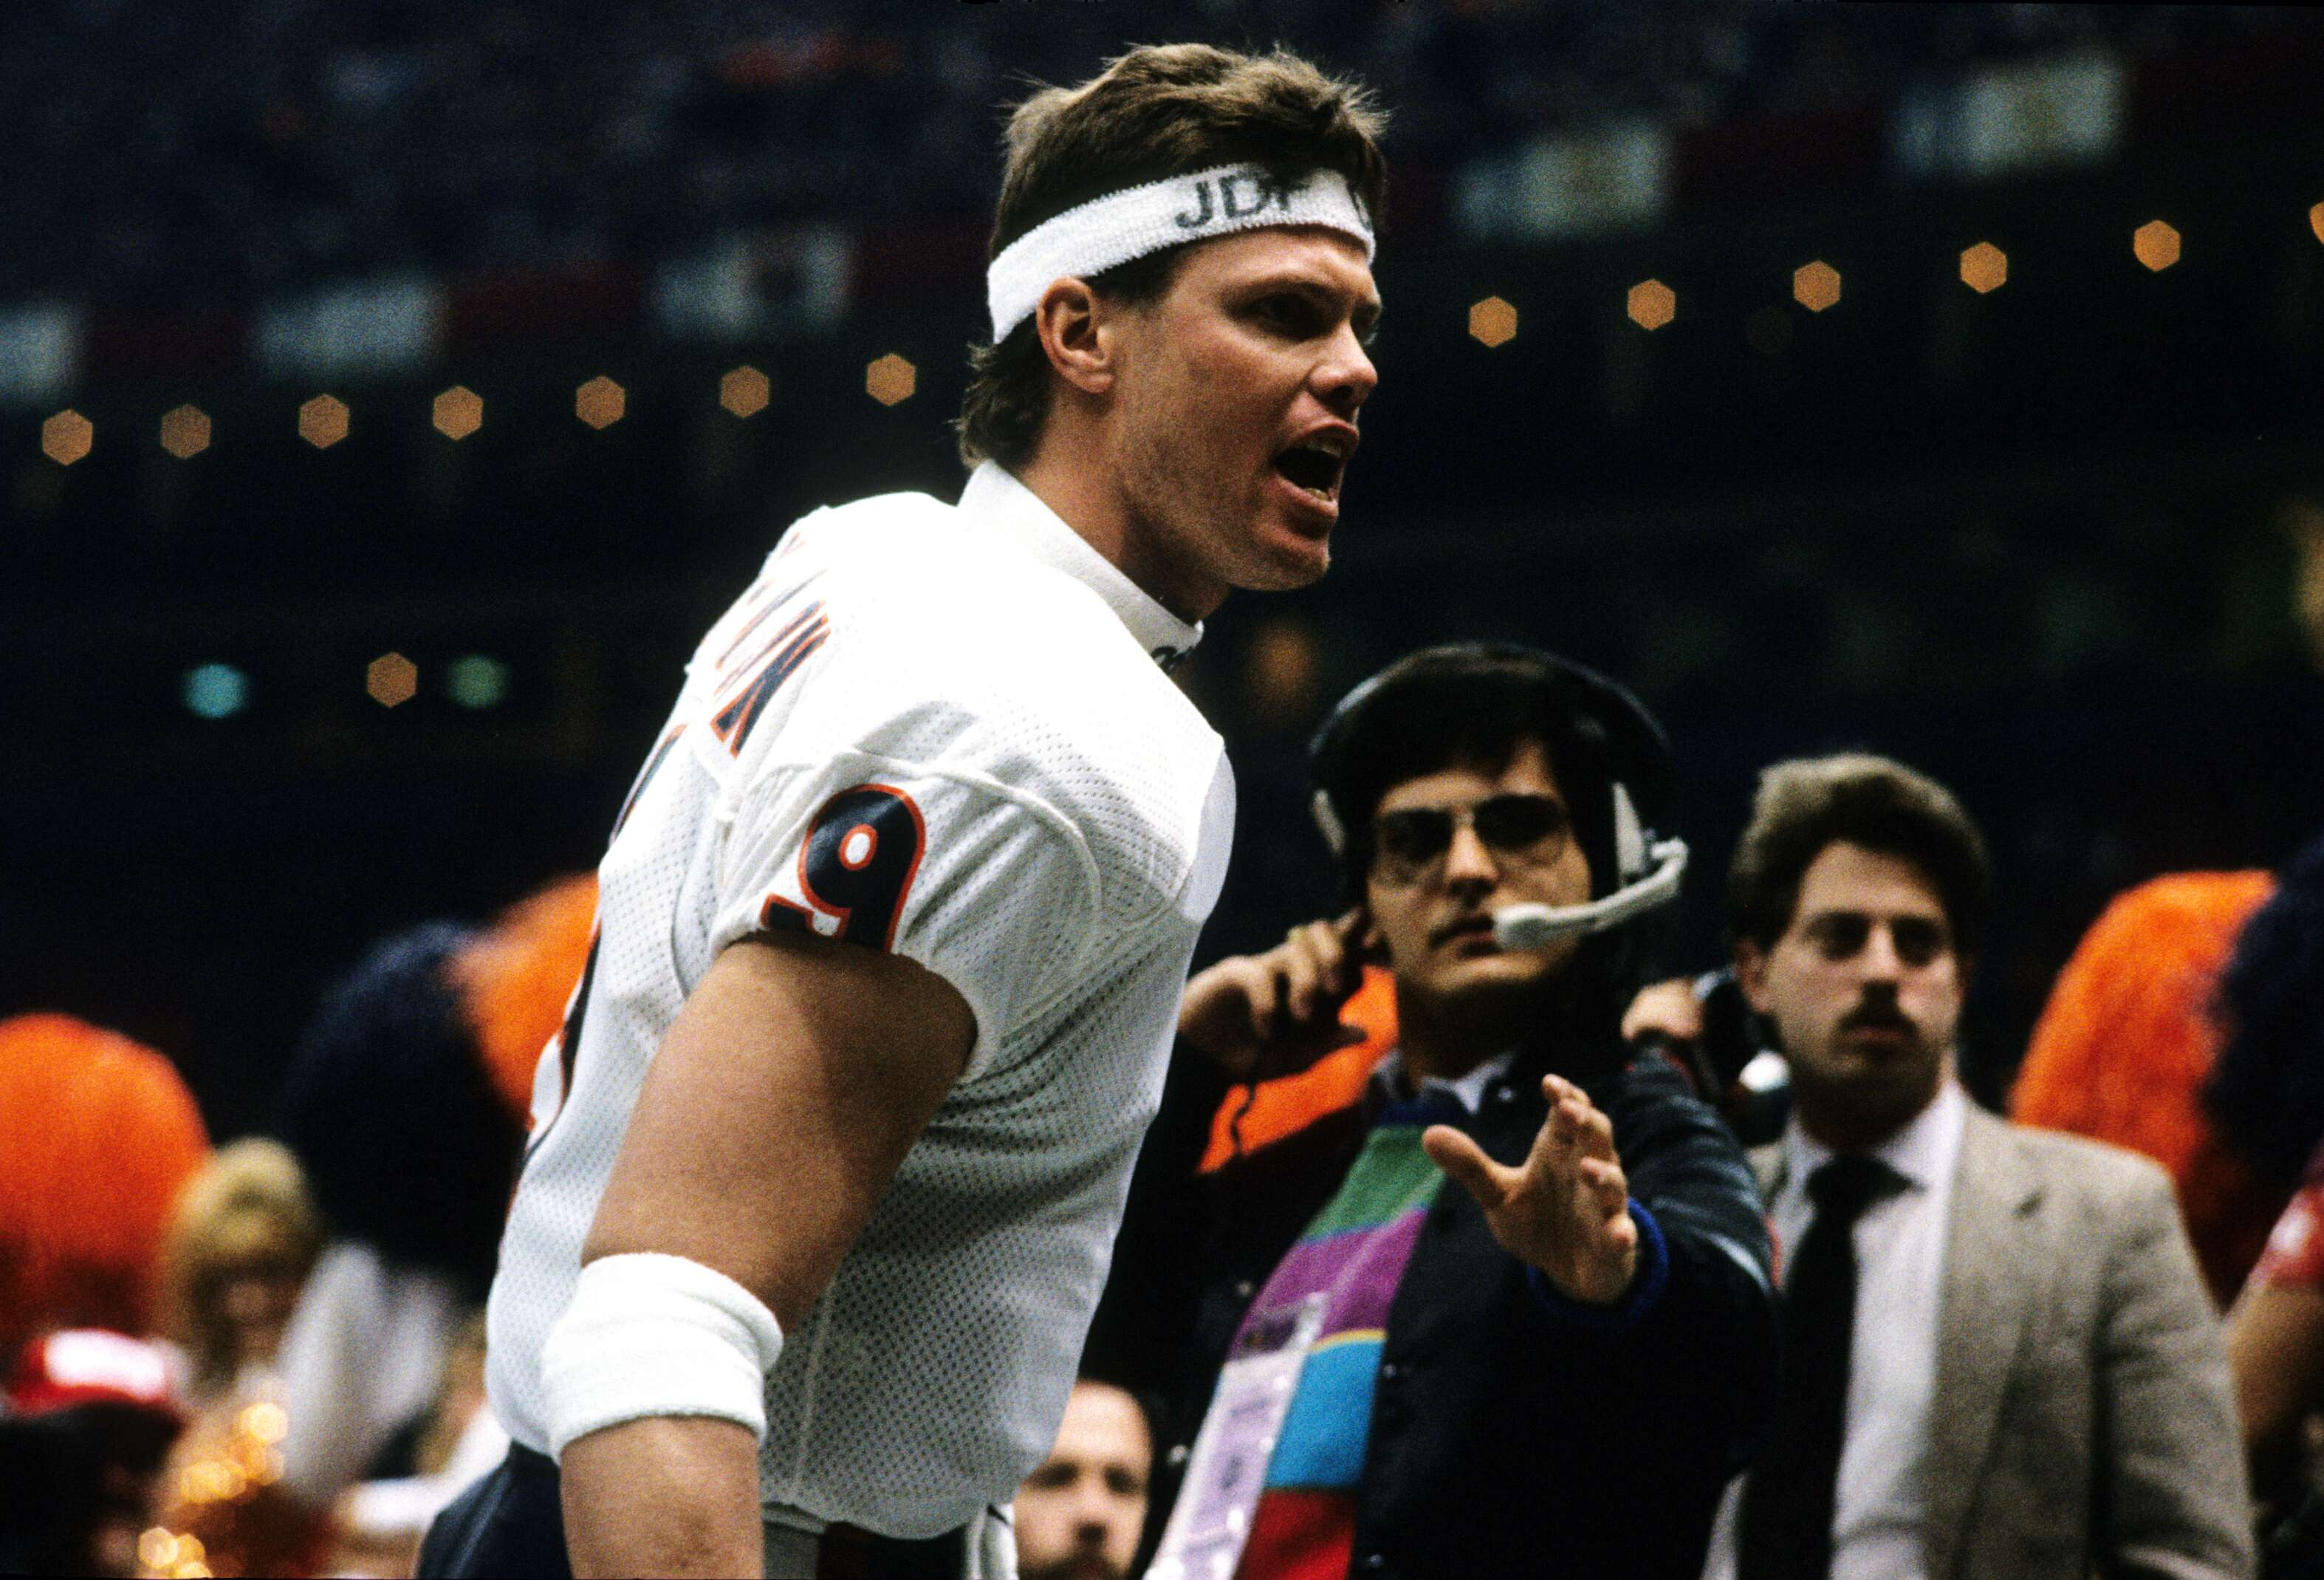 Quarterback Jim McMahon of the Chicago Bears celebrates after winning Super Bowl XX